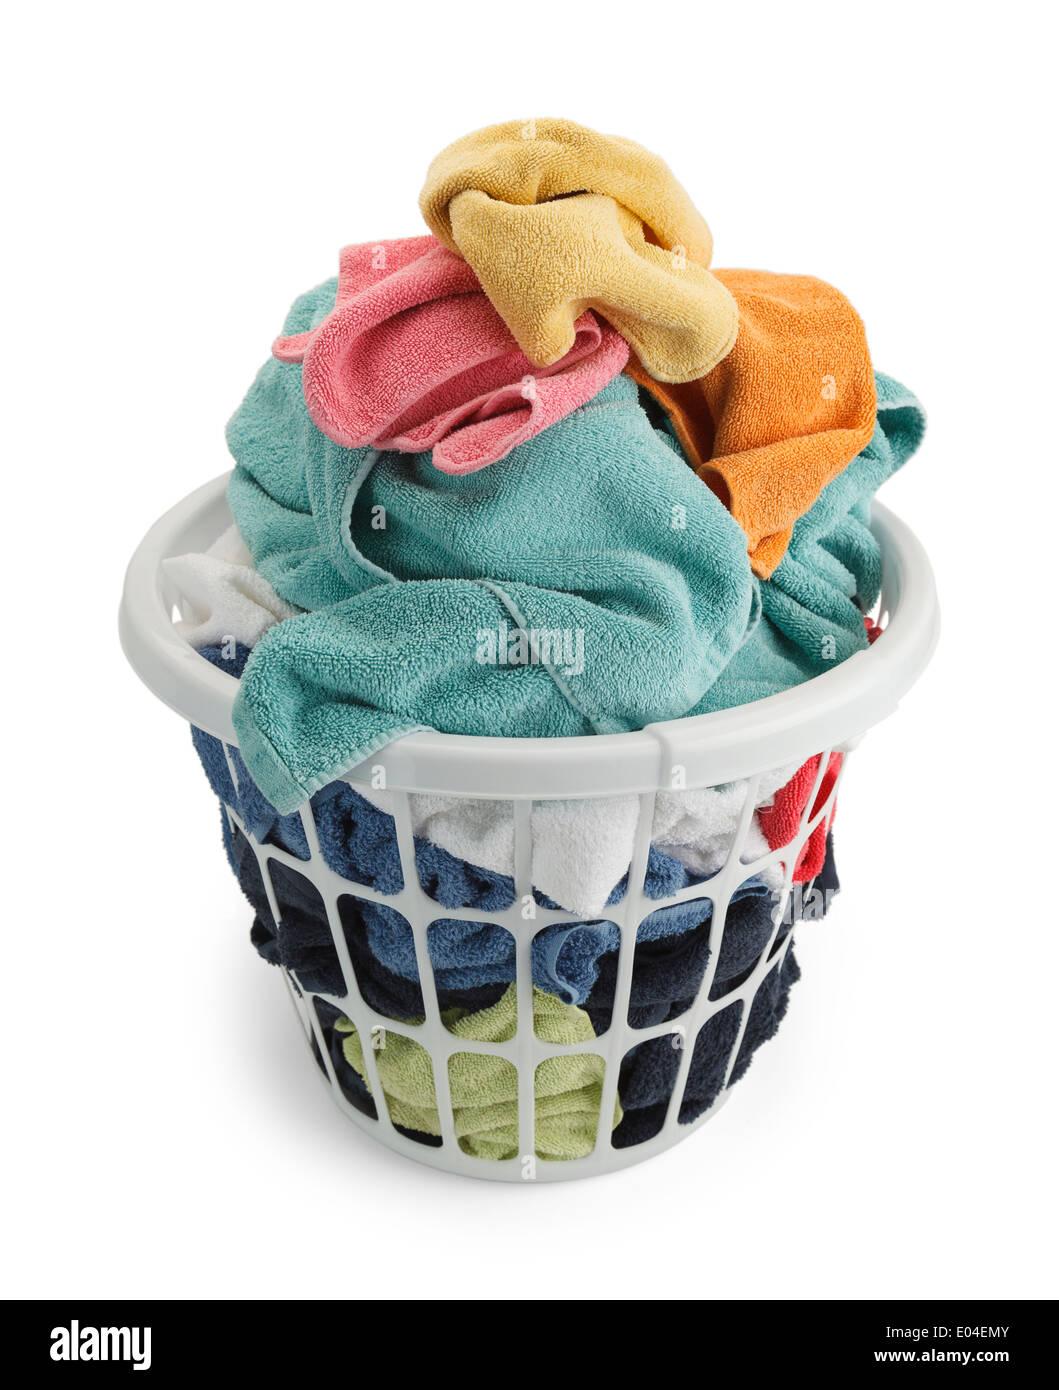 Basket of Unfolded Towels Isolated on White Background. - Stock Image